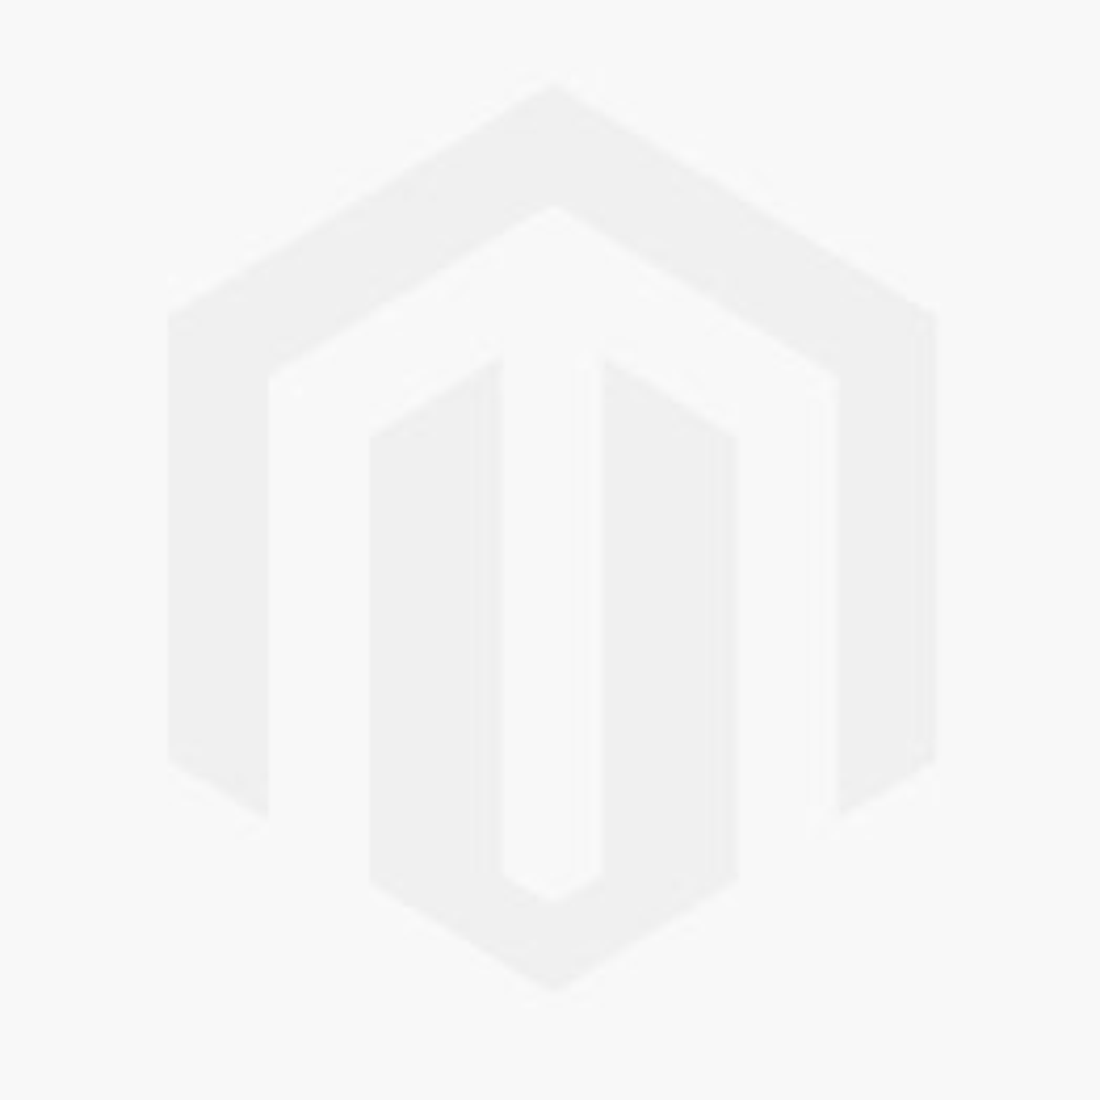 Albert Irvin OBE RA Untitled opus w.2 (framed)